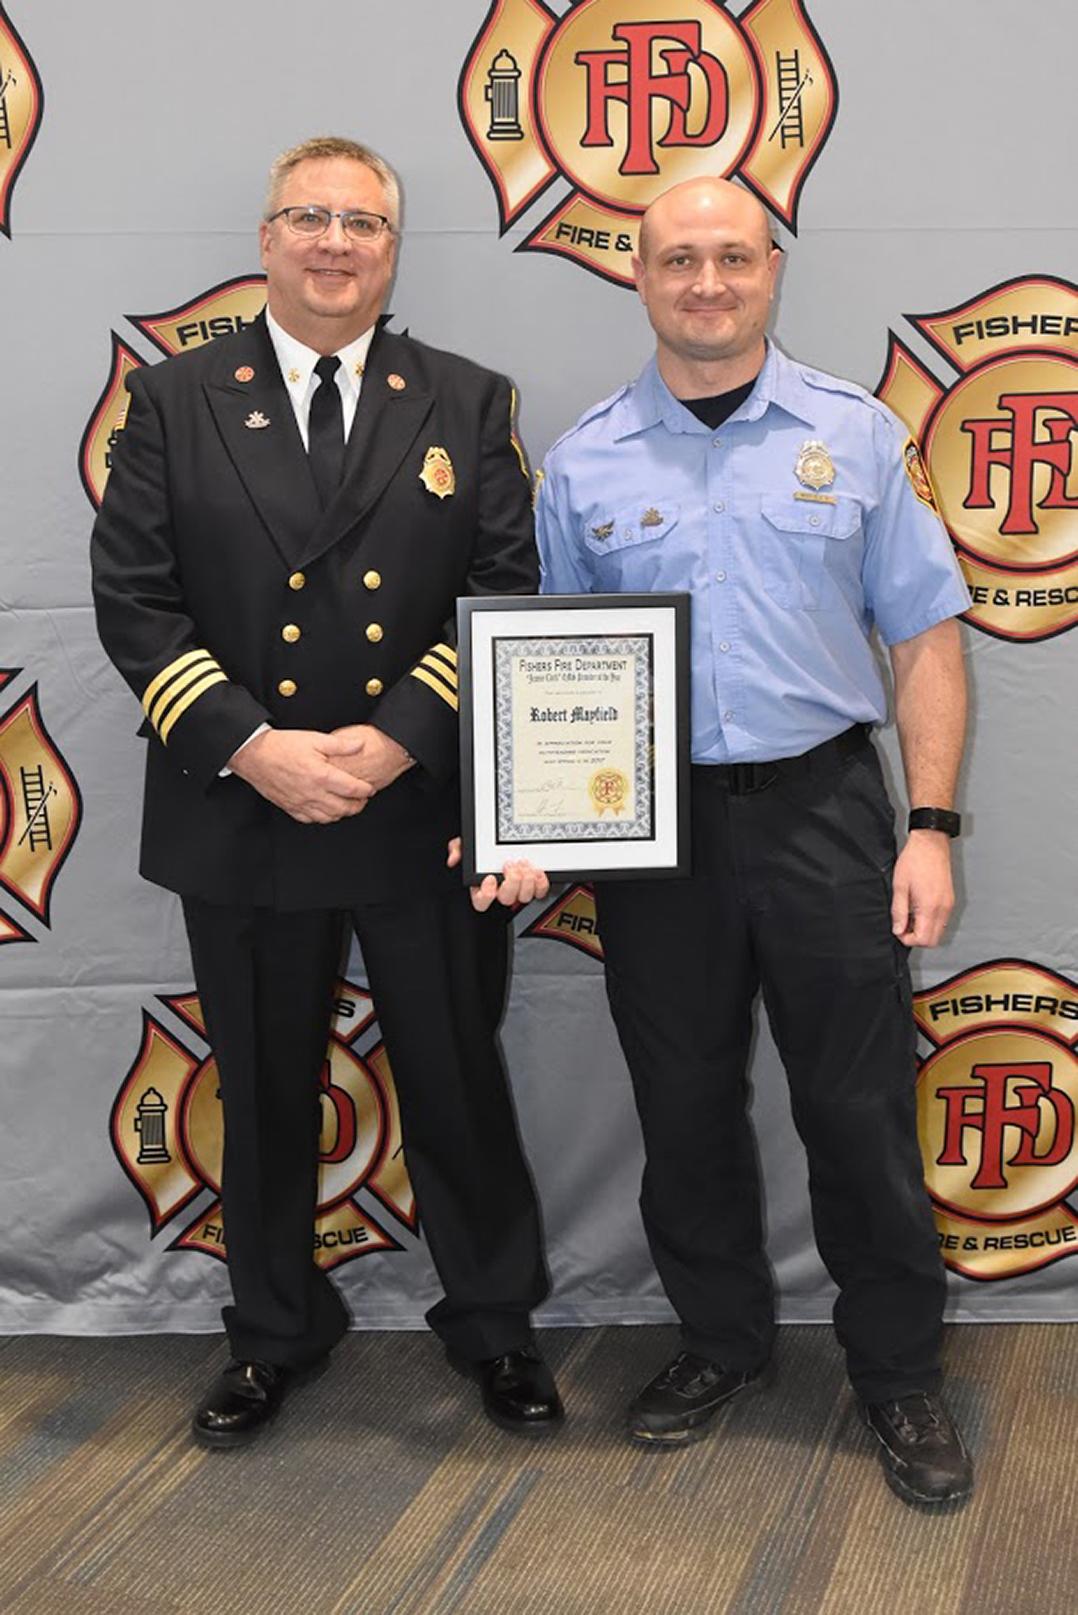 robert mayfield getting an award from another firefighter